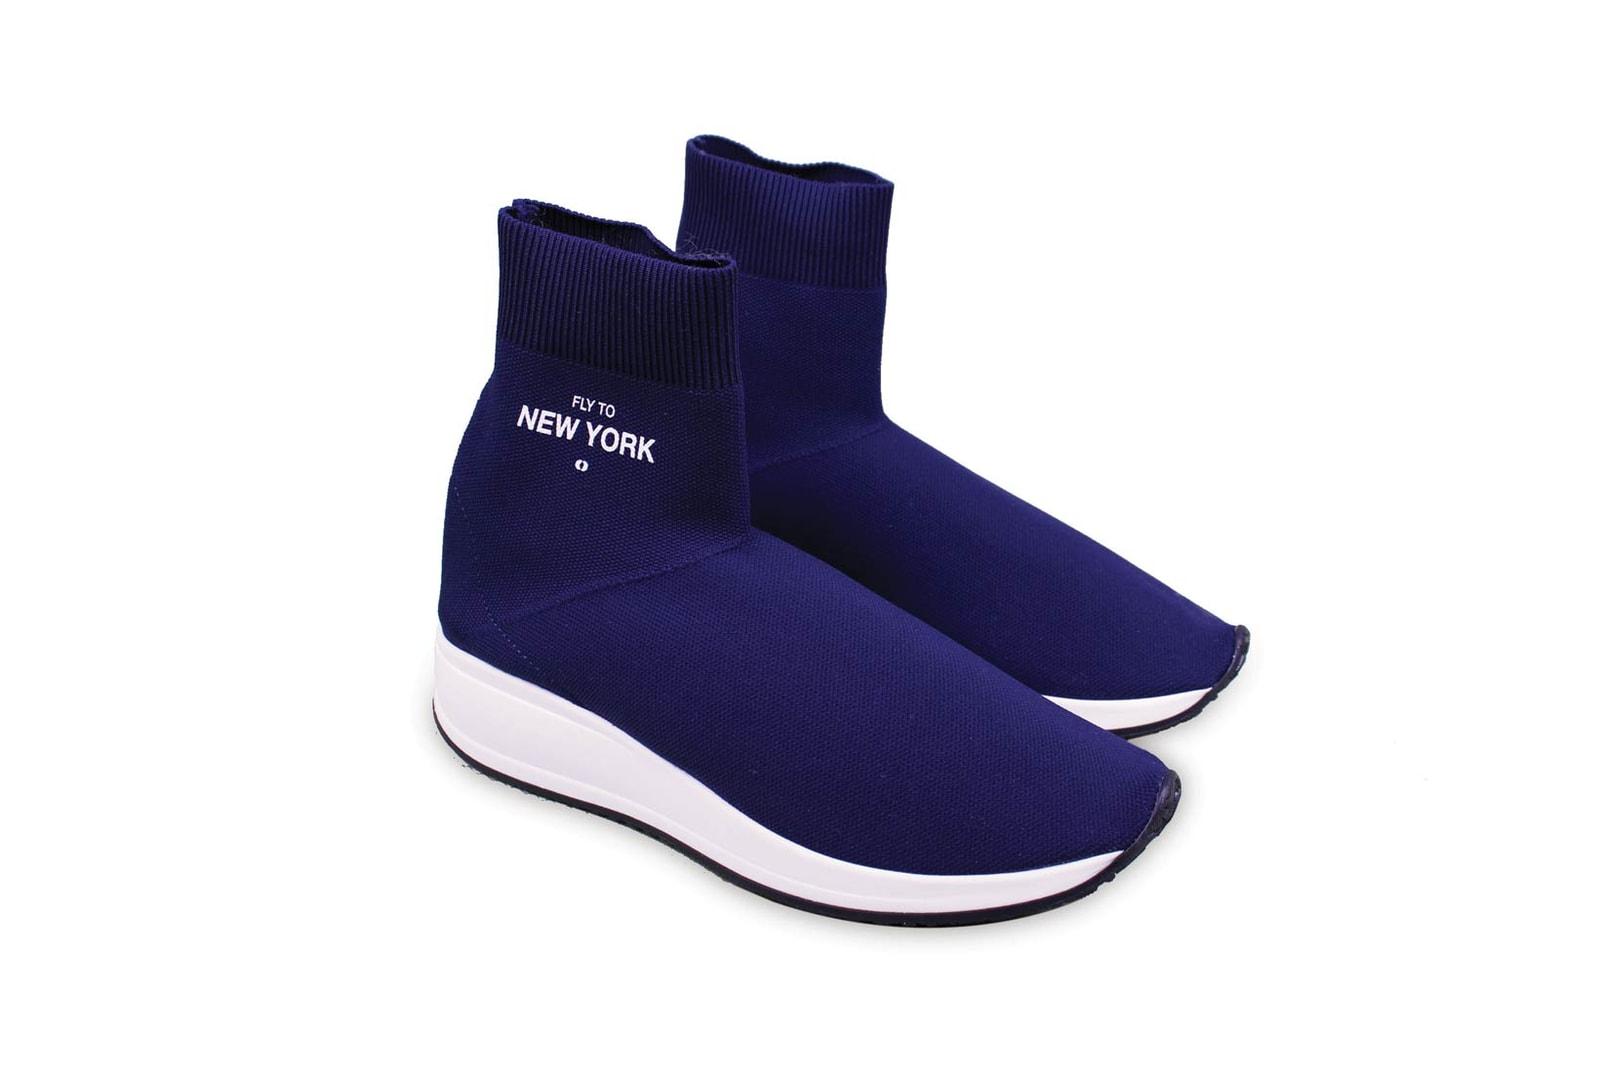 Joshua Sander FLY TO Sneakers Irene Kim